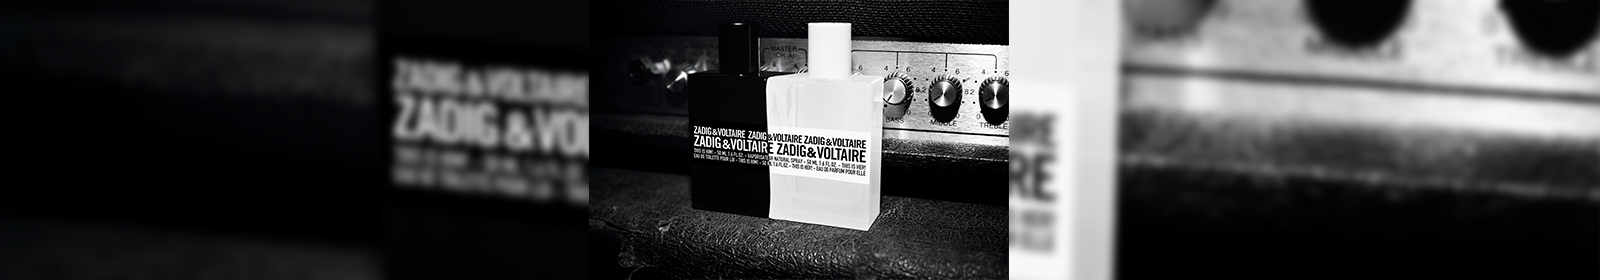 cosmetice/parfumuri zadig_voltaire dama